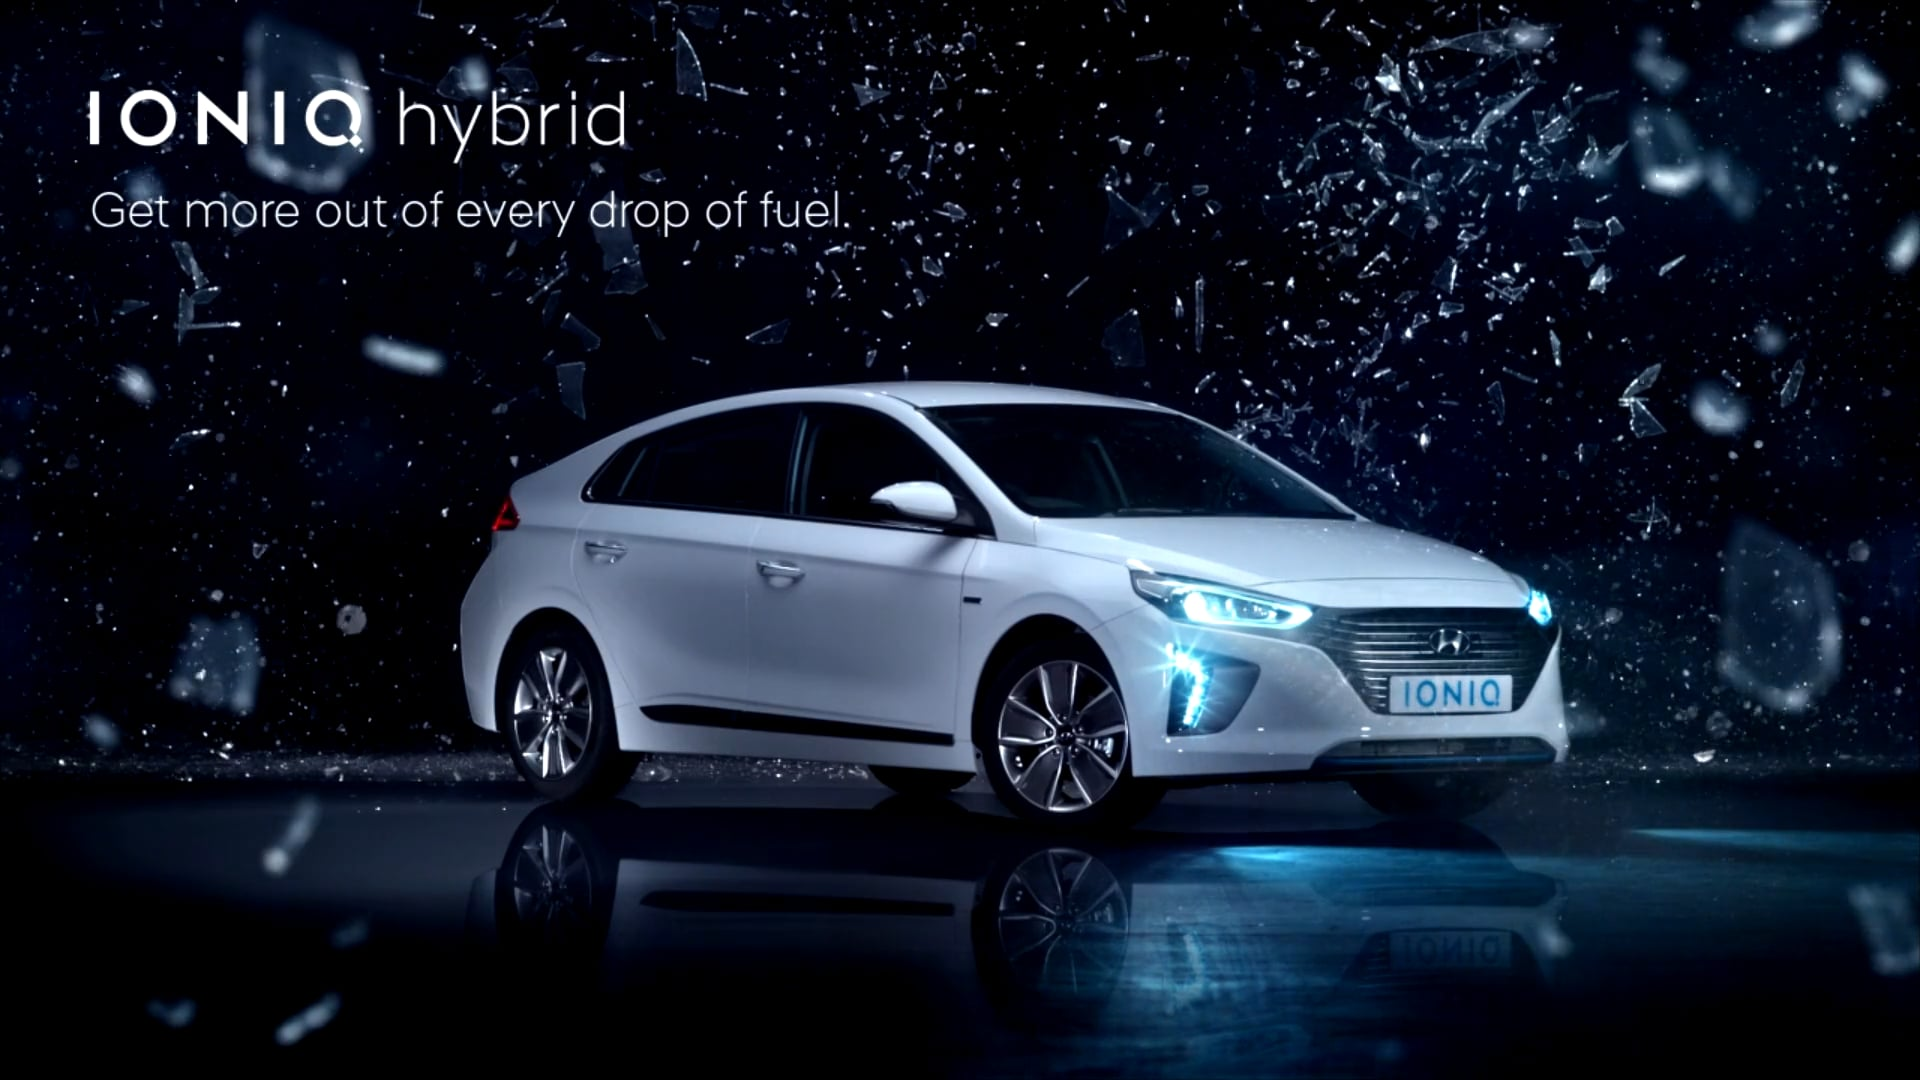 (TV UK Version) Hyundai IONIQ Hybrid - The Amazing Drop of Fuel